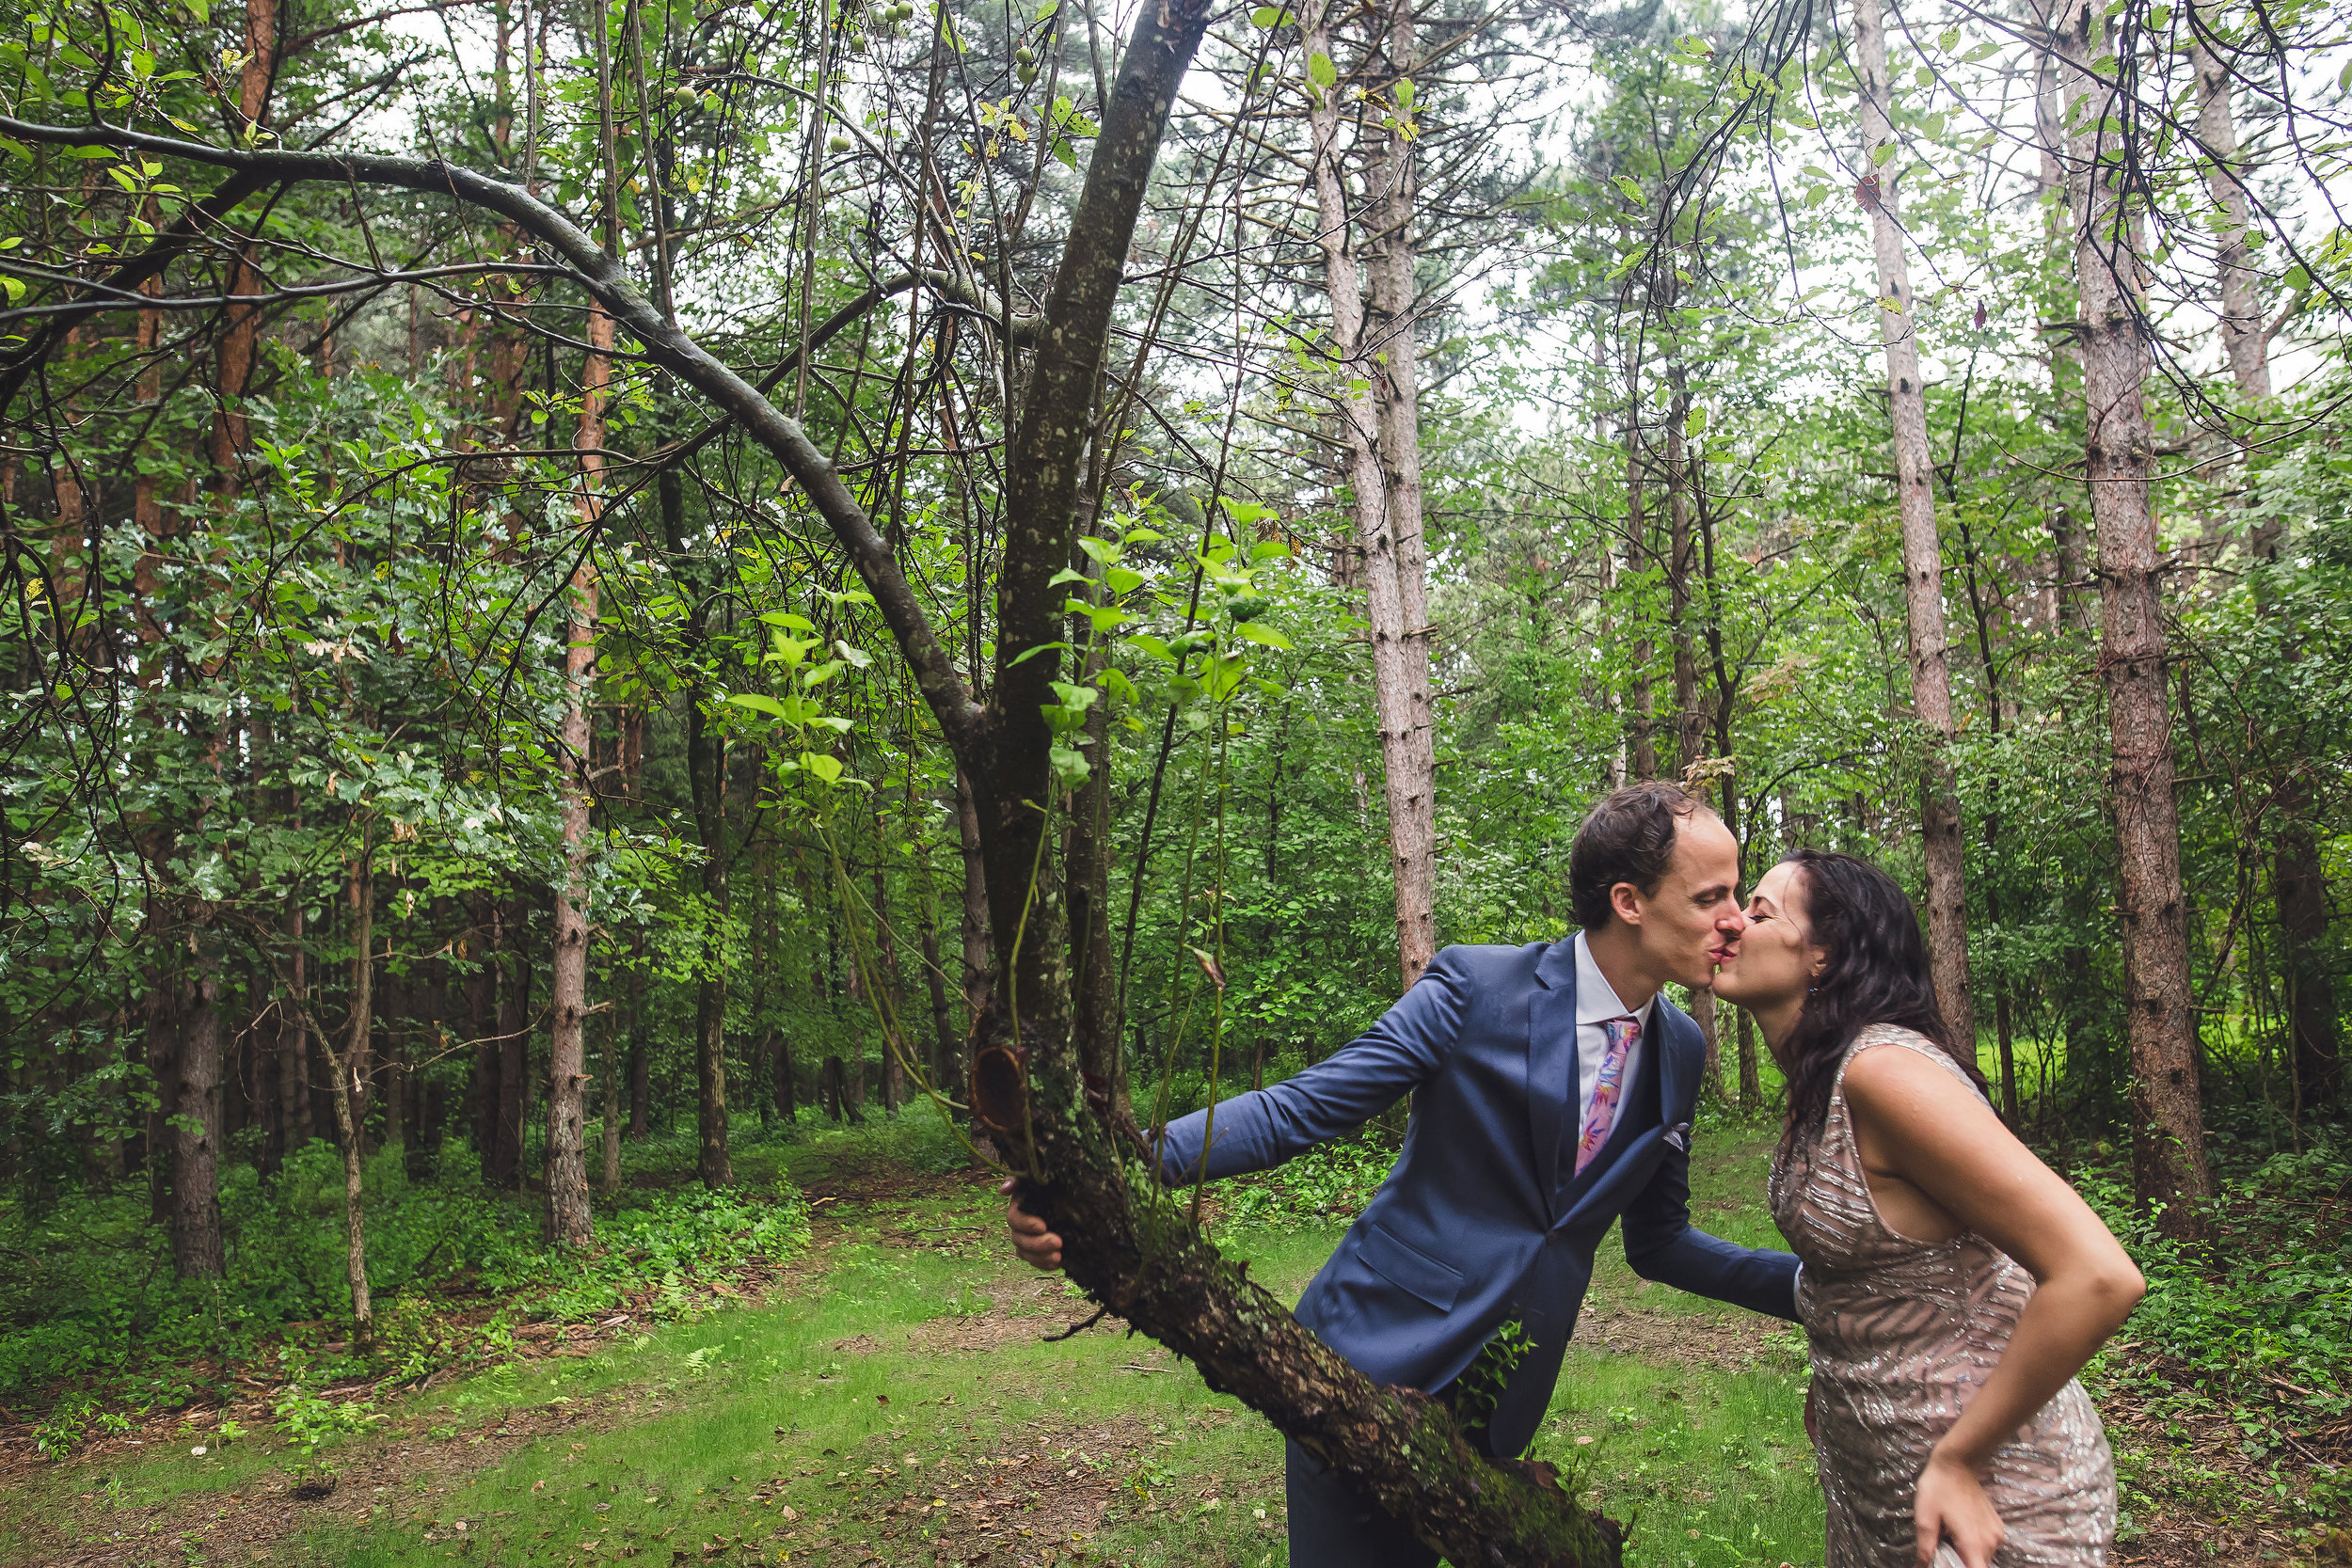 upstate-ny-wedding-jove-meyer-events-inbal-sivan-097.jpg